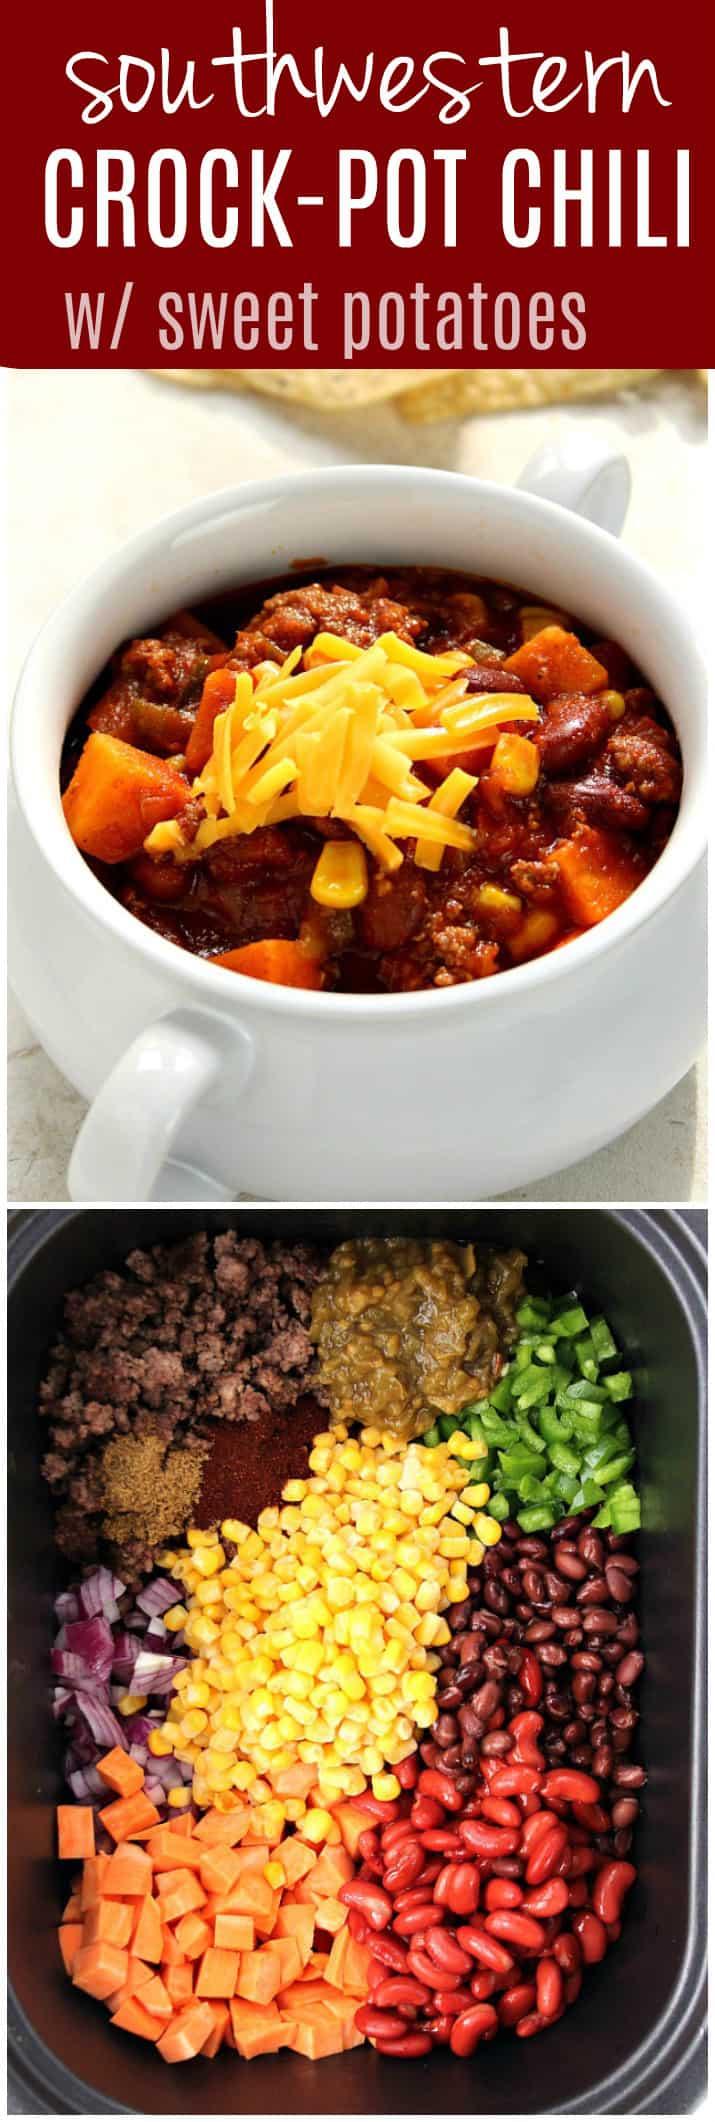 pot chili with sweet potatoes recipe long1 Southwestern Crock Pot ...